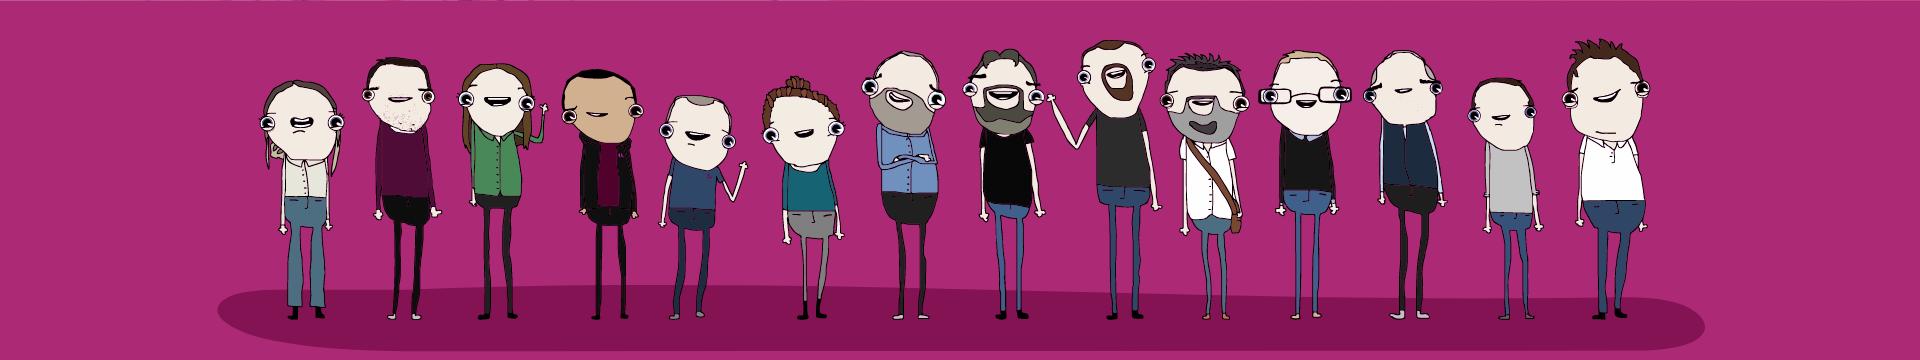 Cheerful drawing of fluxLoop employees.